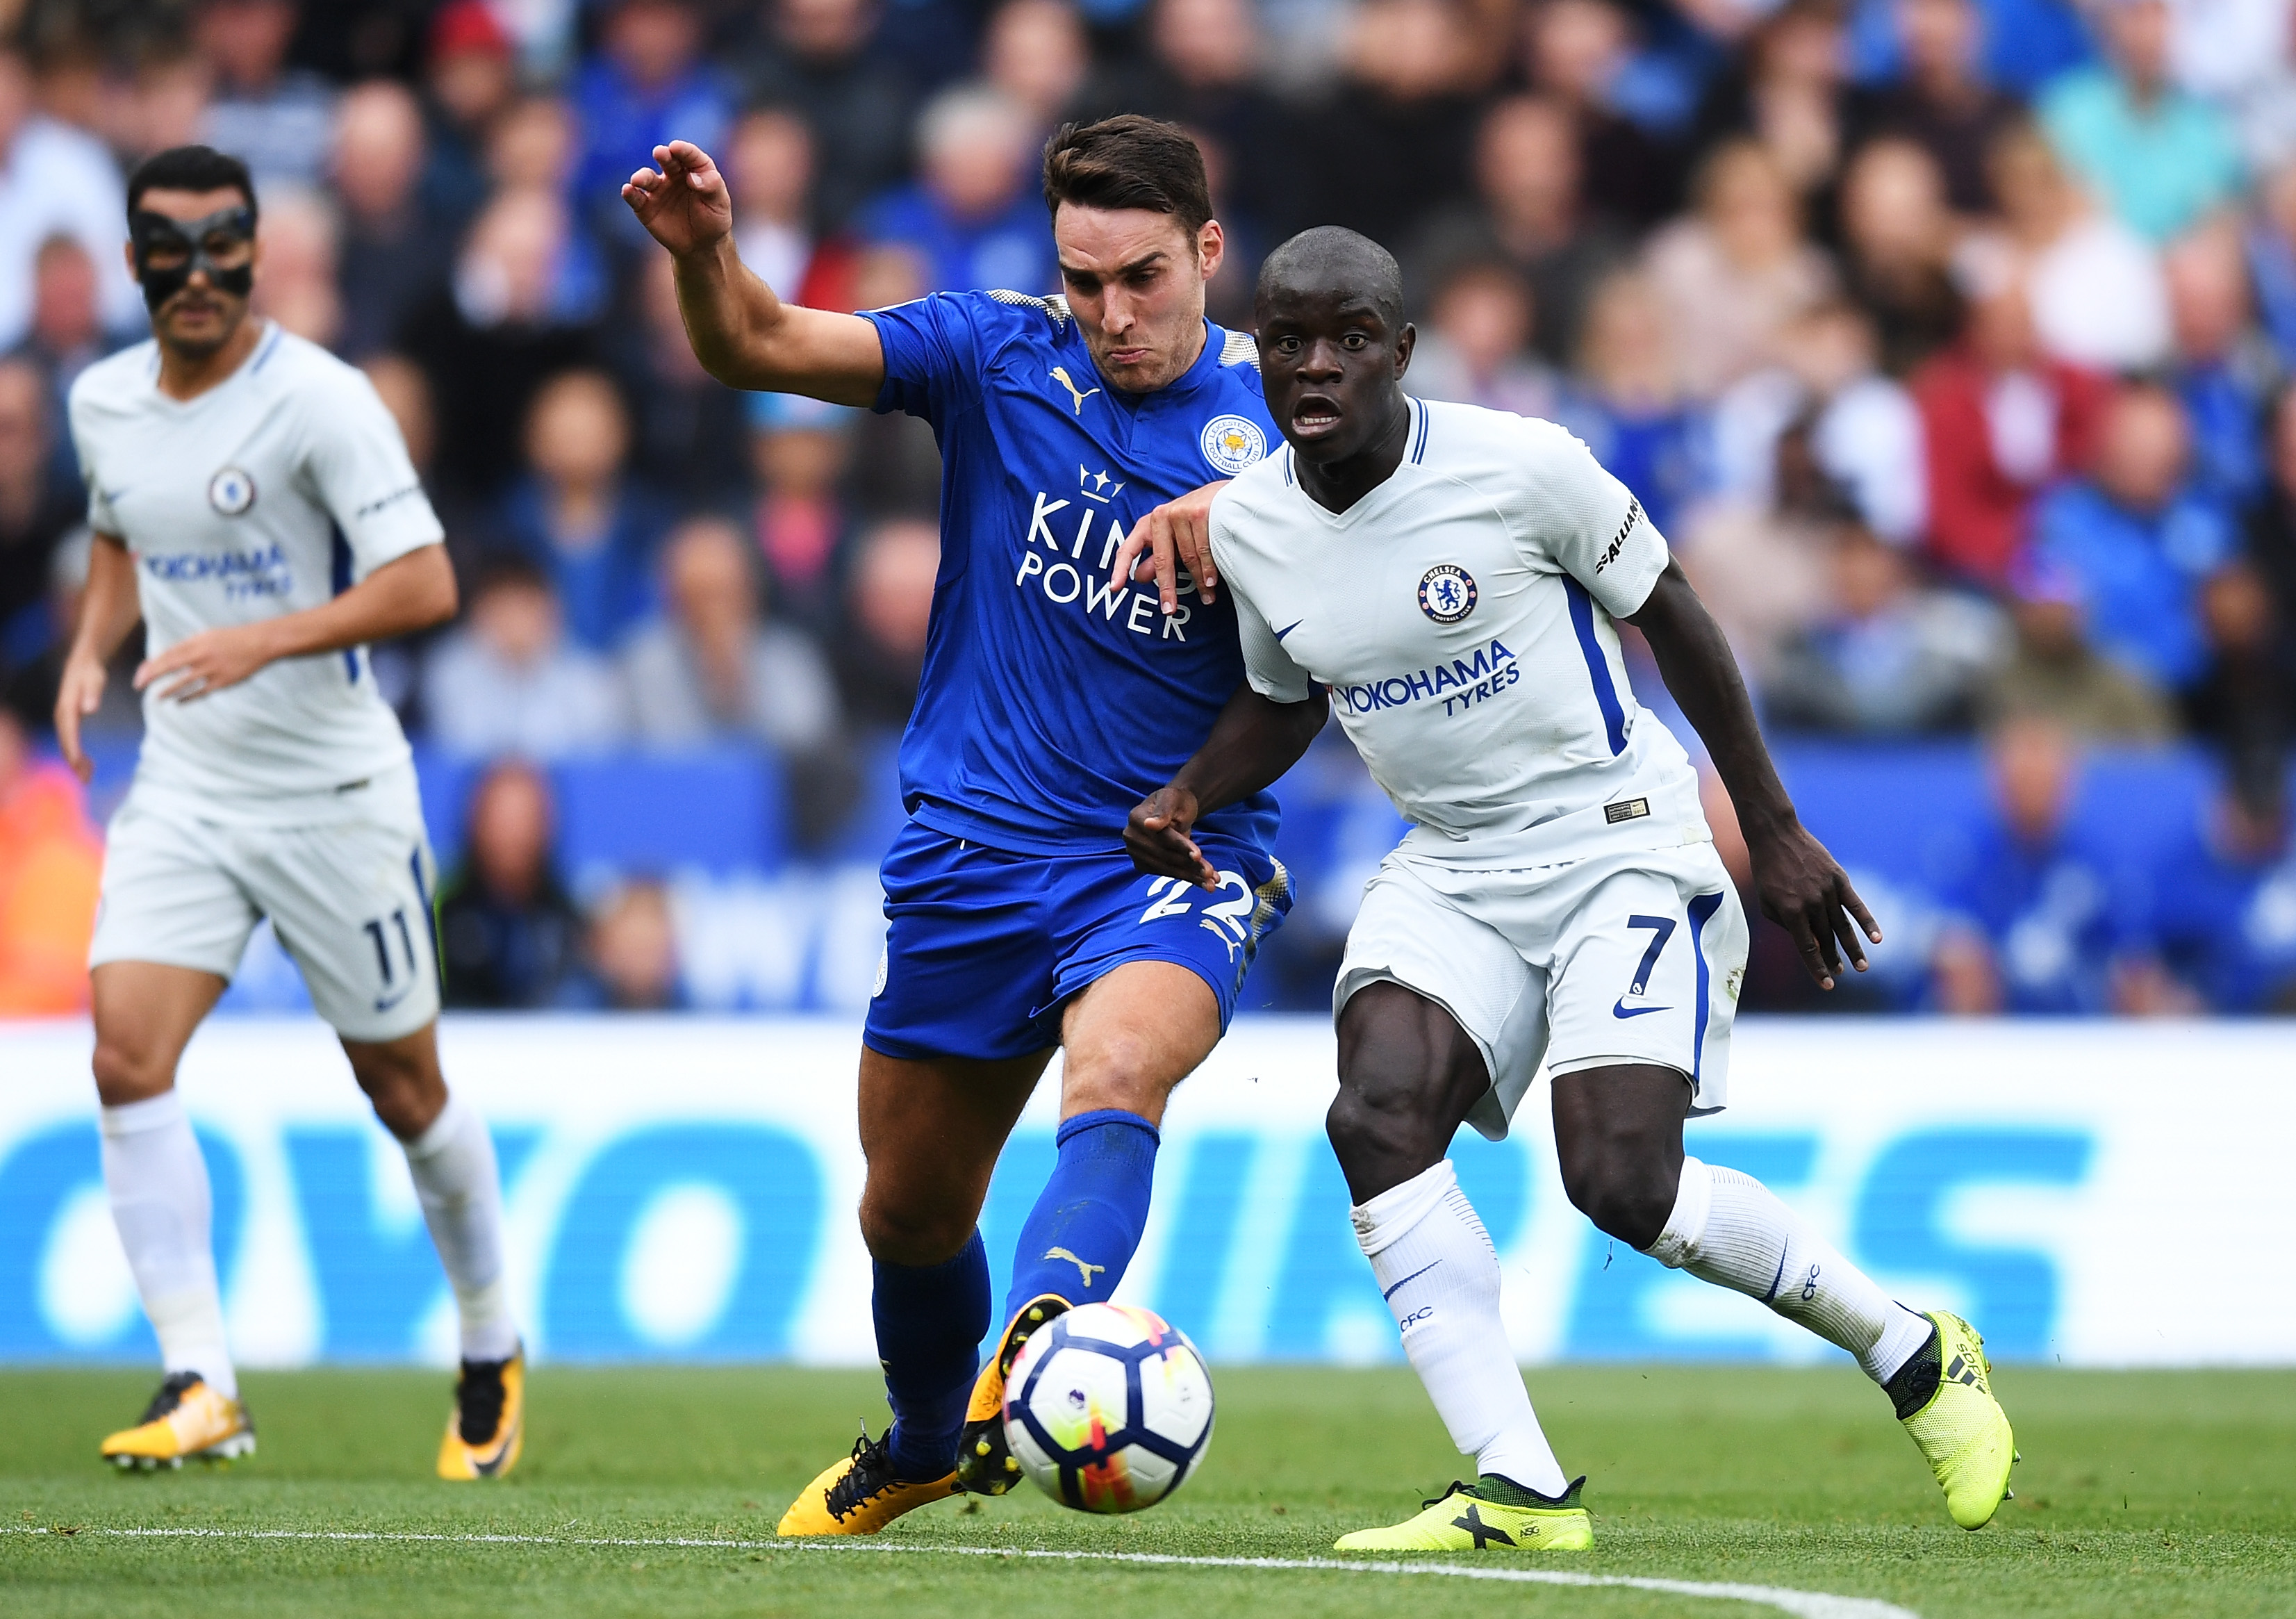 Chelsea's Champions League return was 'perfect', says Antonio Conte